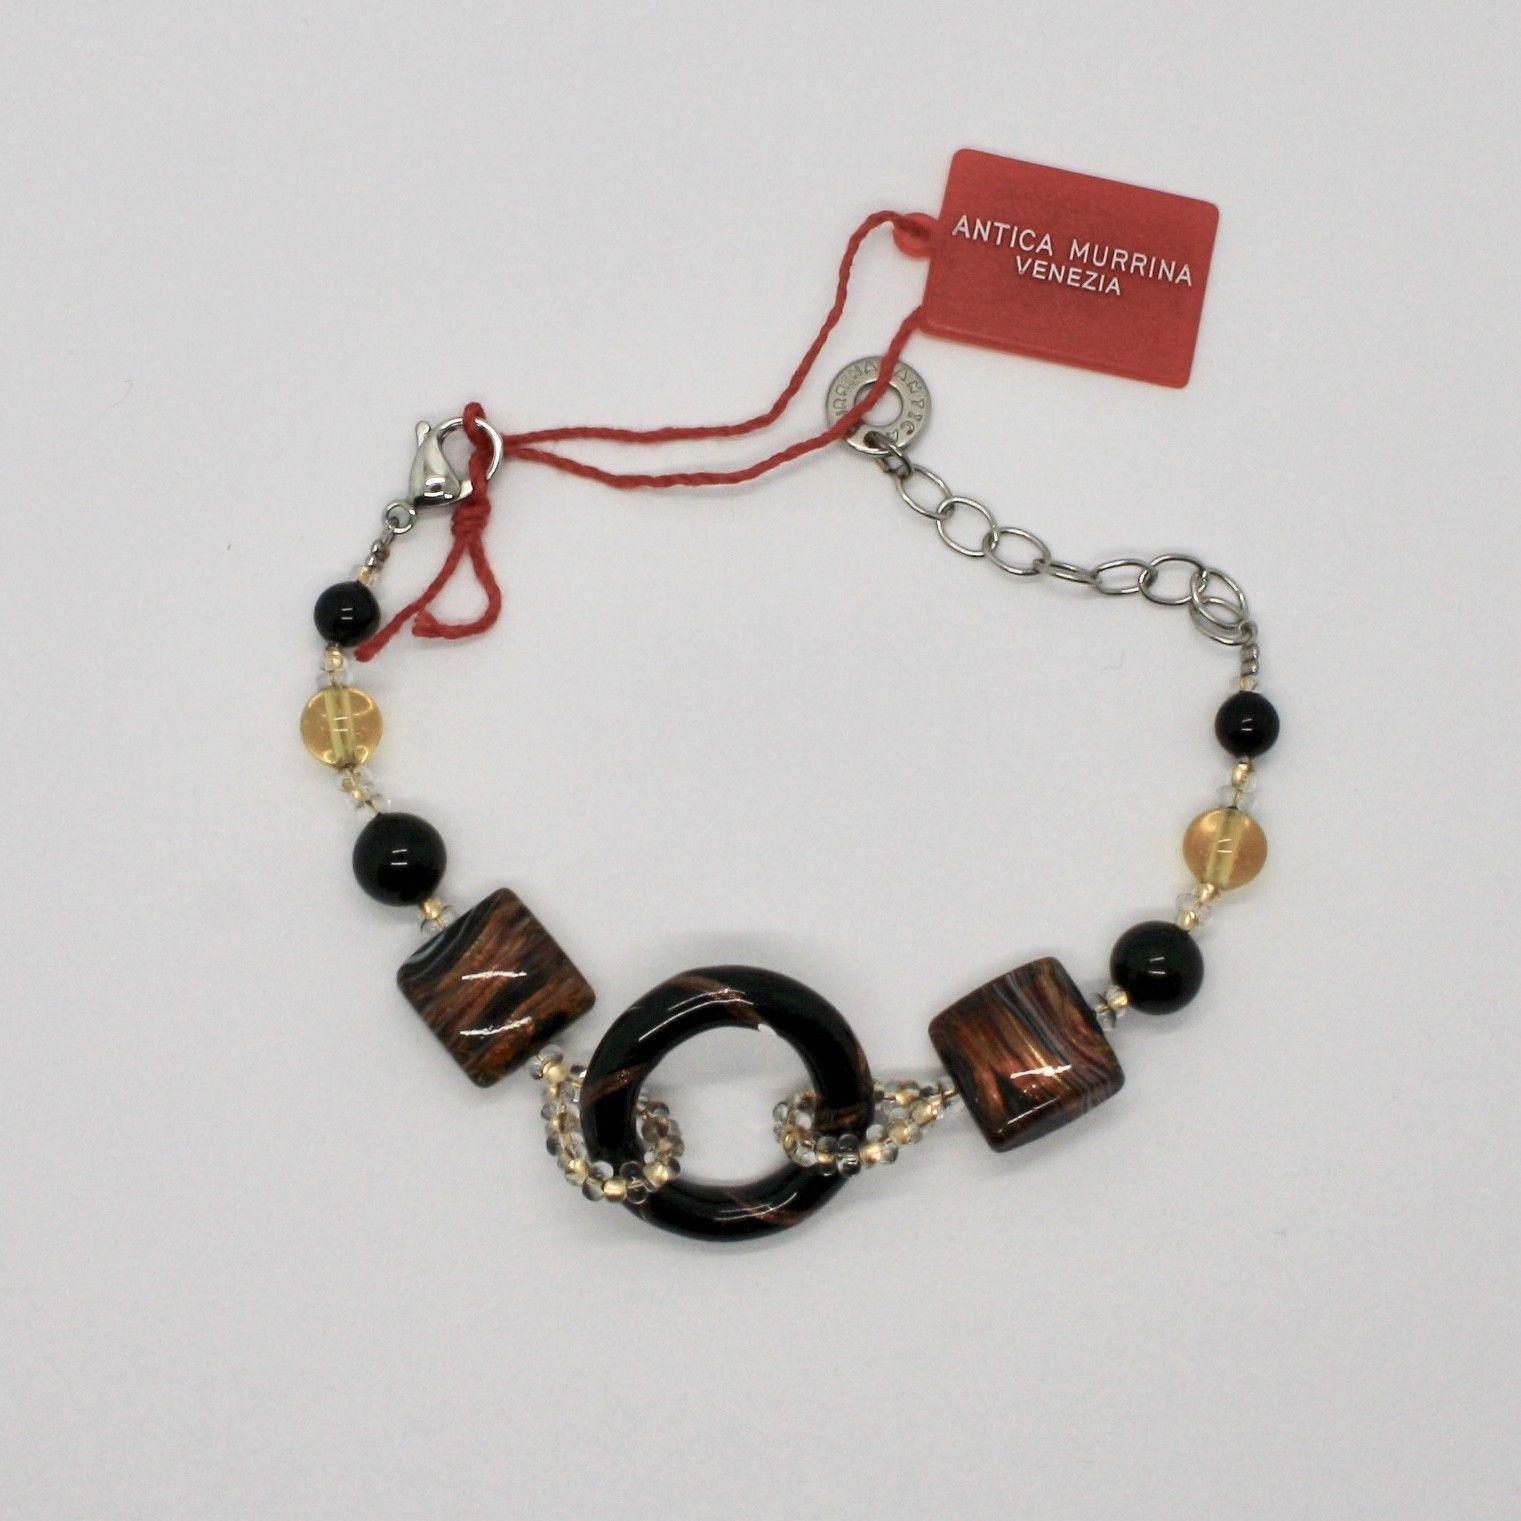 ANTICA MURRINA VENEZIA BRACELET WITH MURANO GLASS BROWN BEIGE BLACK BR567A14